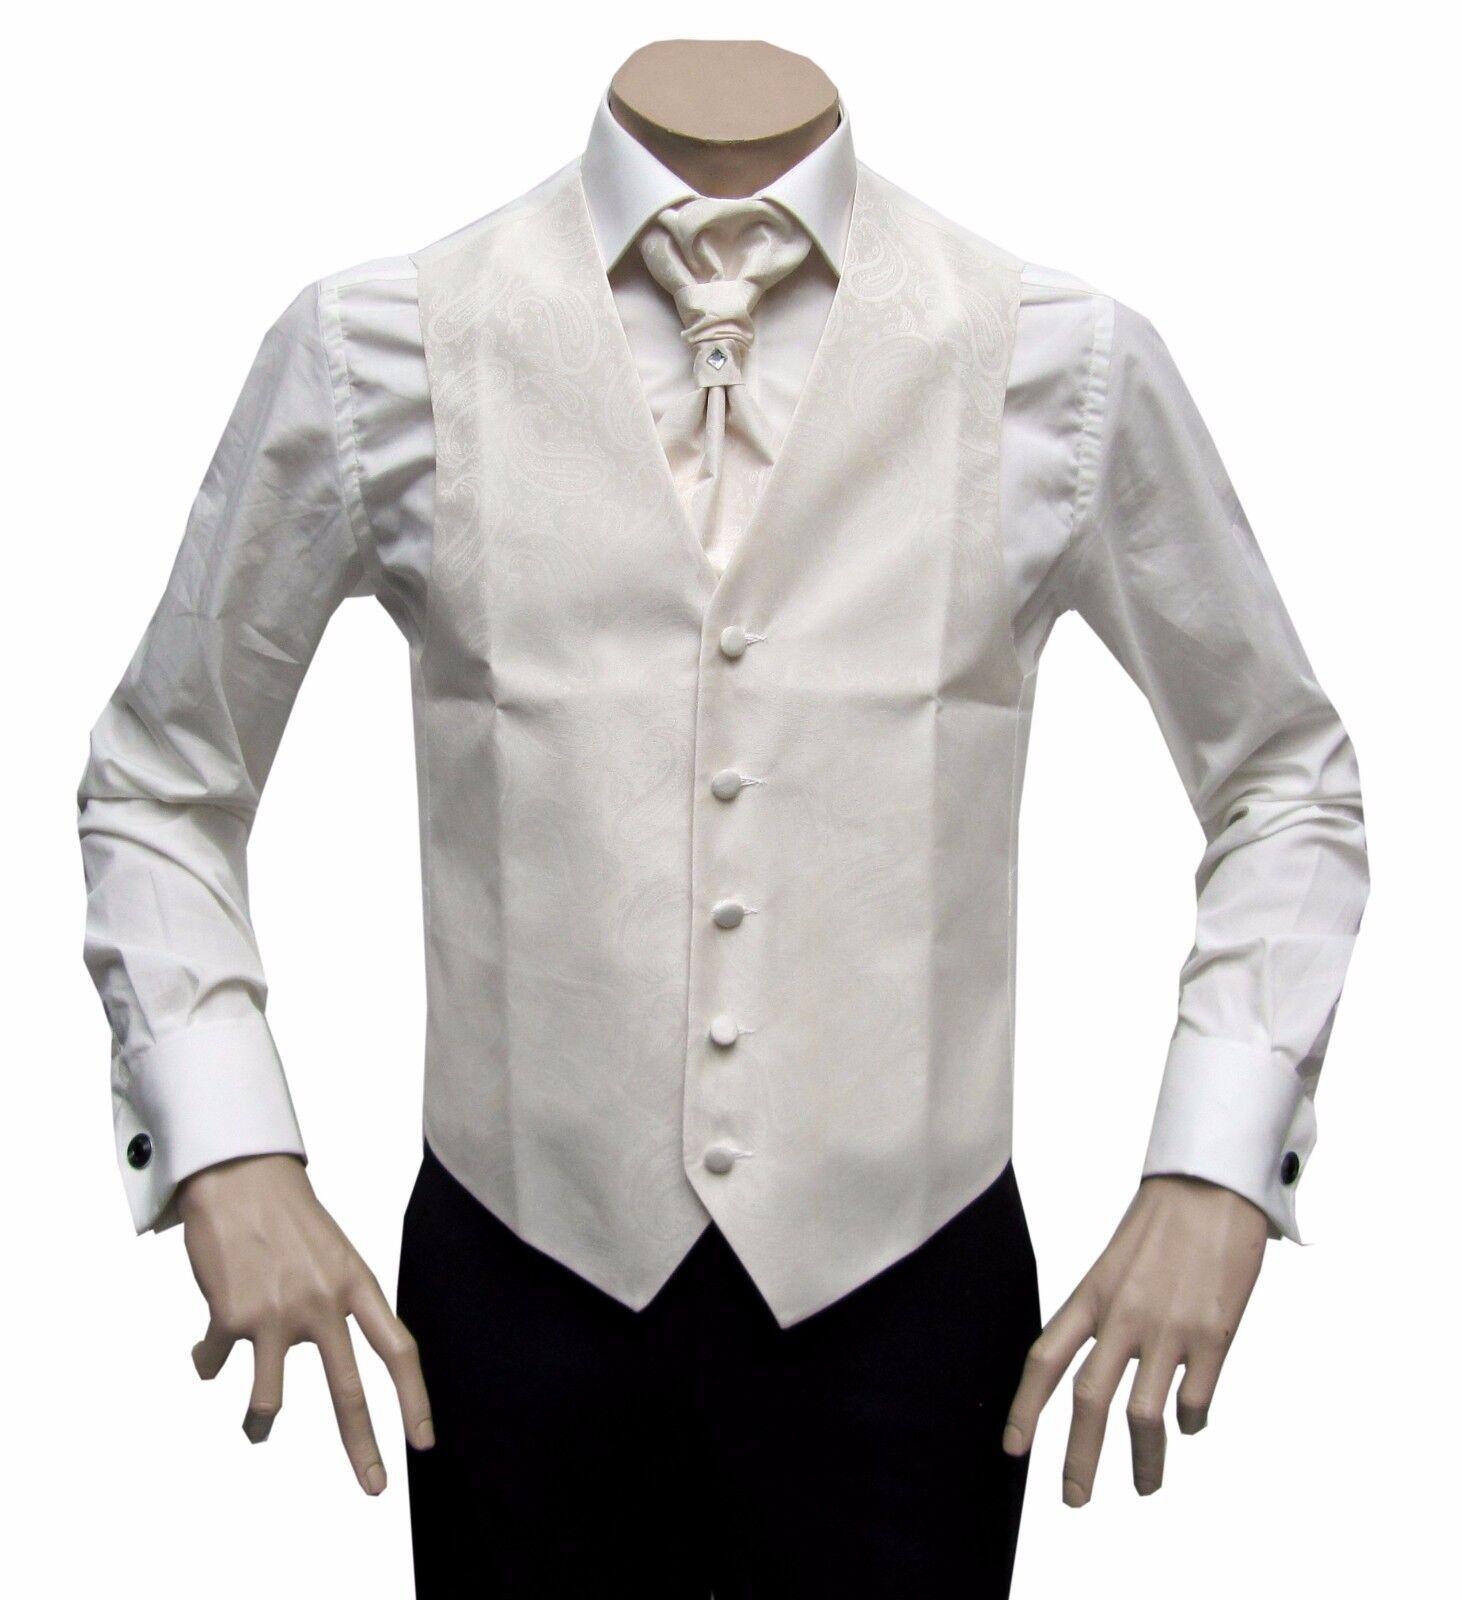 Men's Wedding Waistcoat 3-teilig Gr.56 Ivory Cream